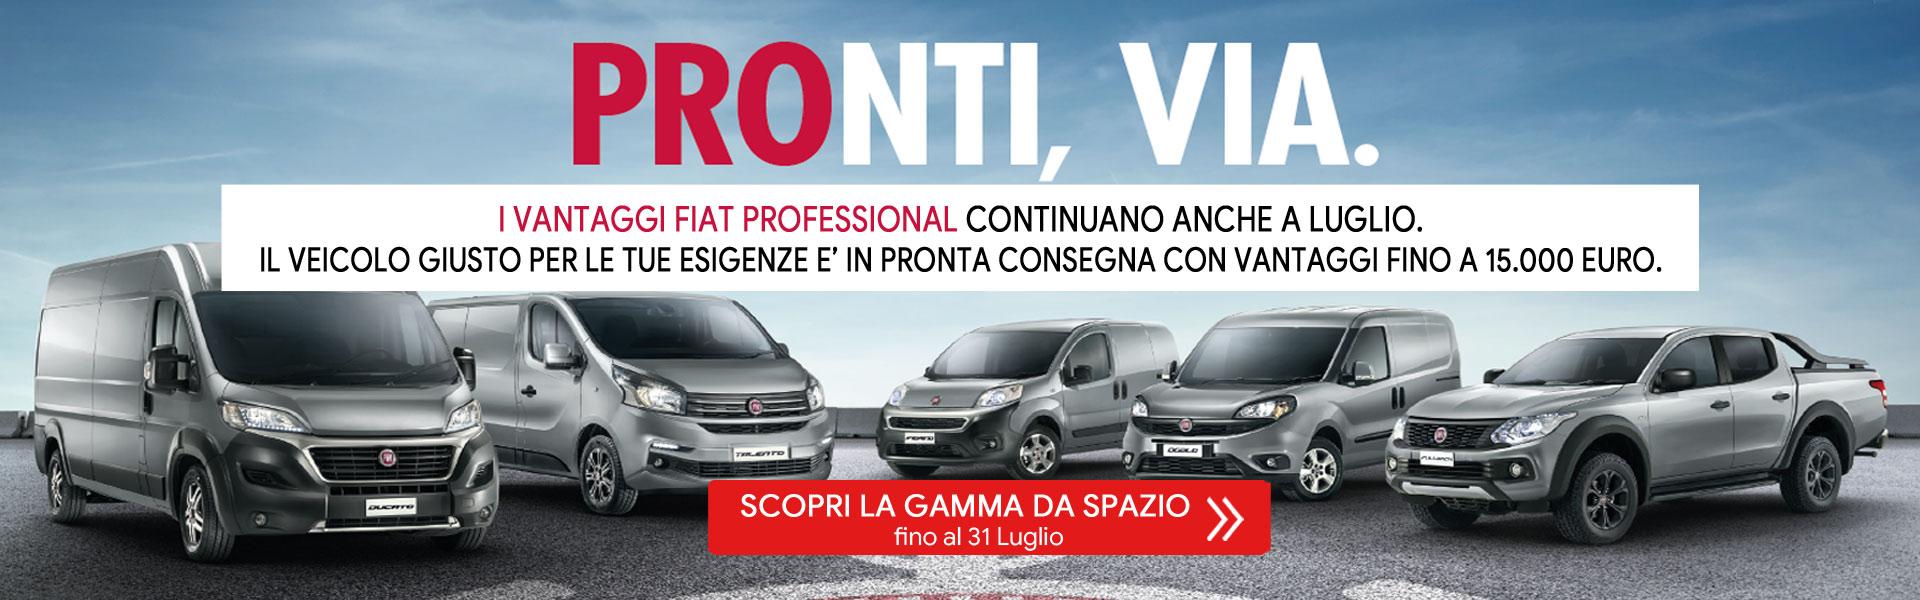 Gamma veicoli Fiat Professional